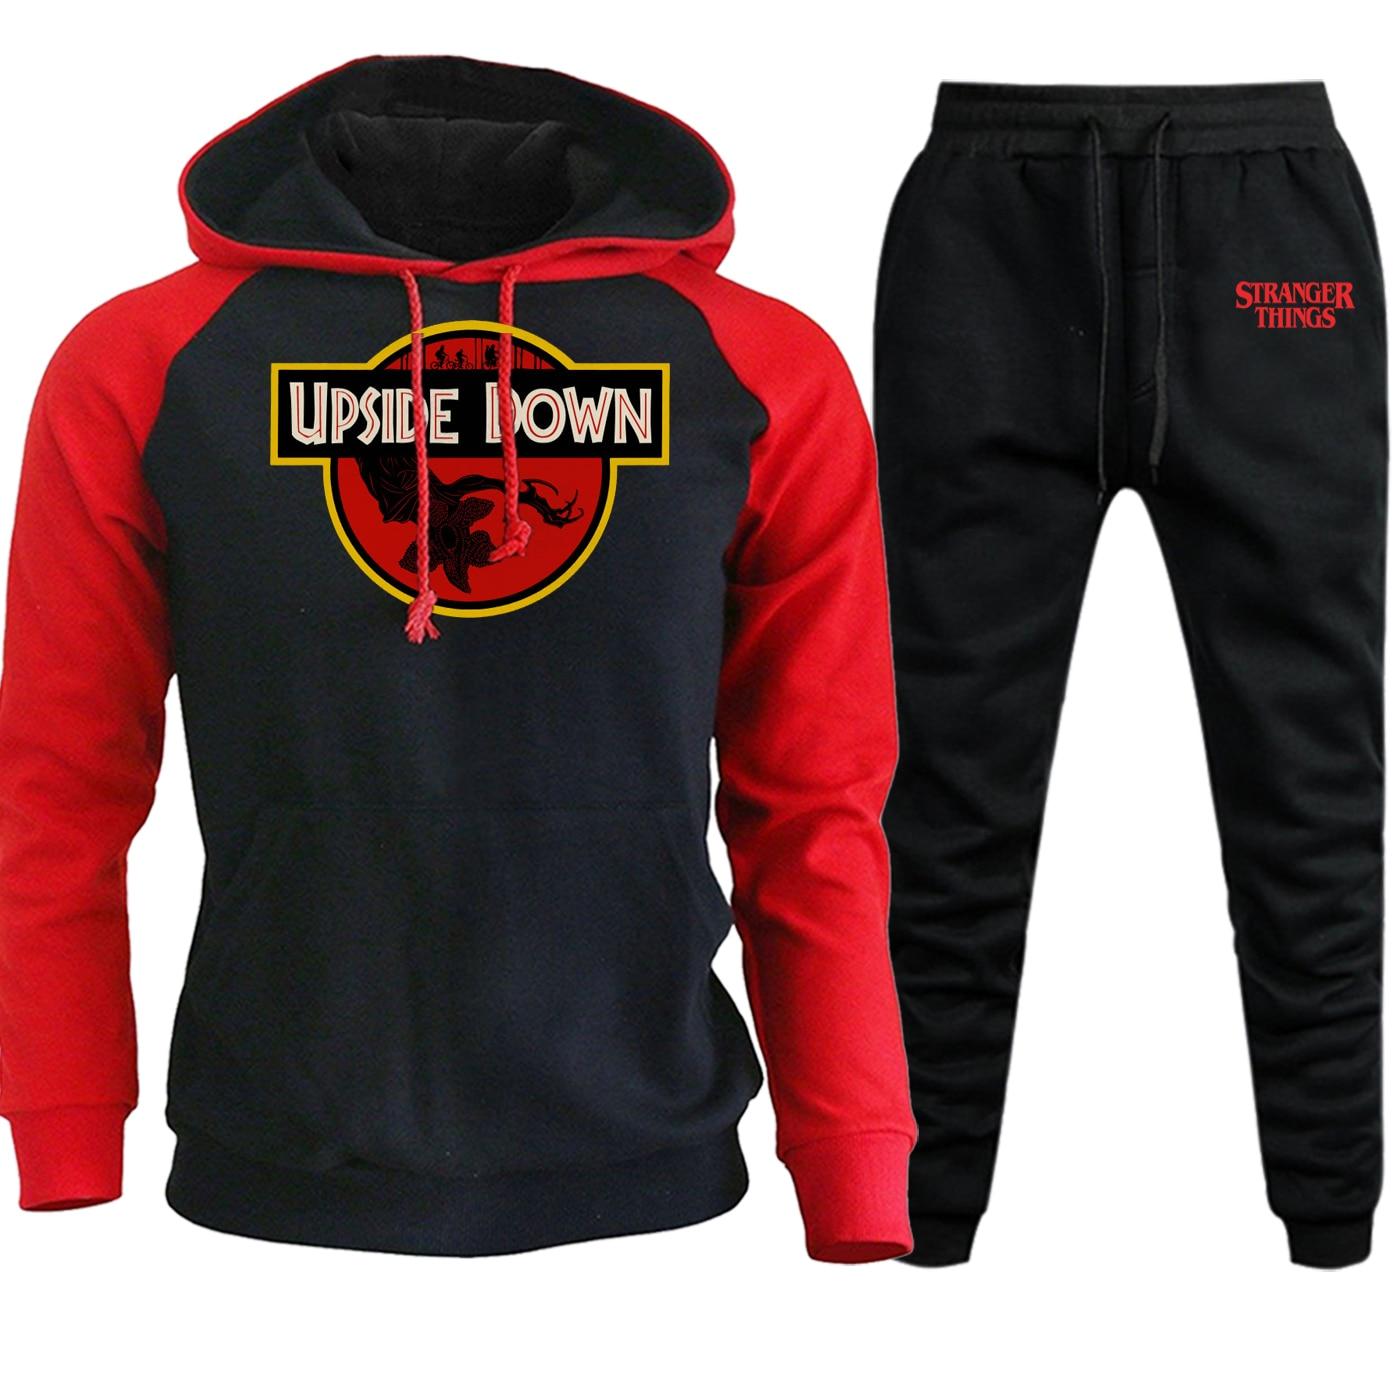 Stranger Things New Autumn 2019 Hooded Mens Streetwear Hip Hop Pullover Suit Casual Hoodie Fleece Sweatshirts+Pants 2 Piece Set